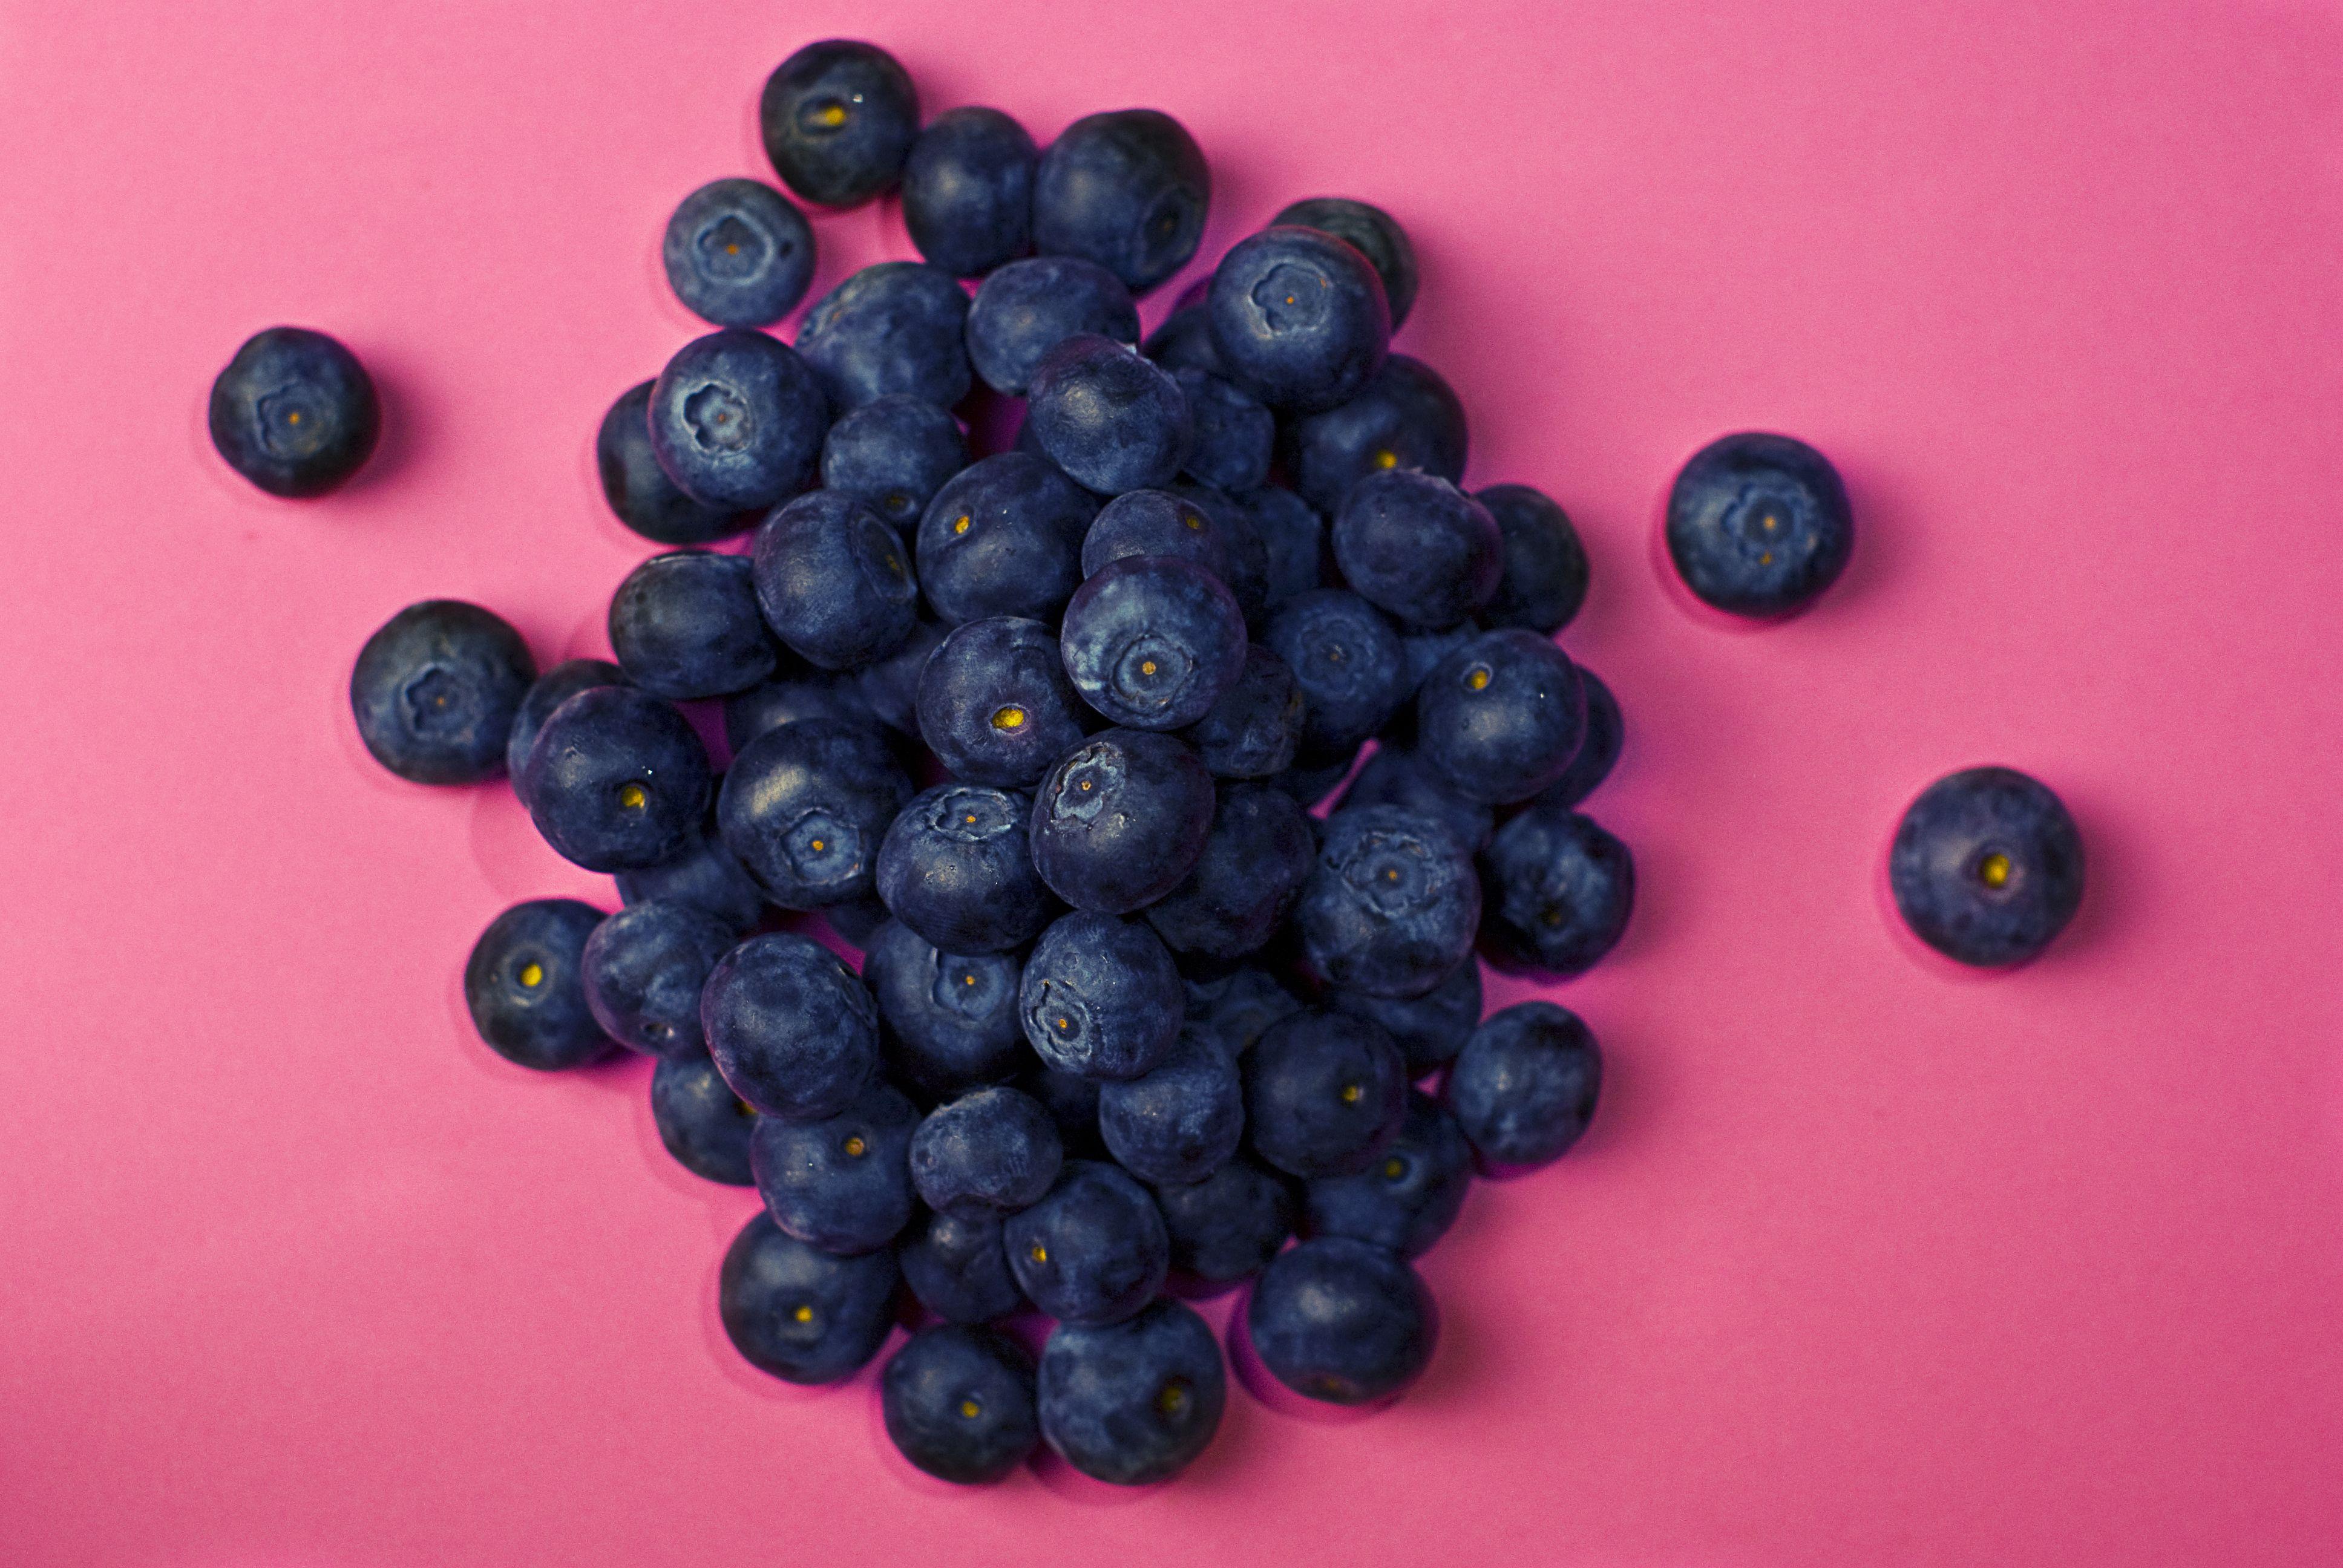 Frutos Rojos, potentes antioxidantes